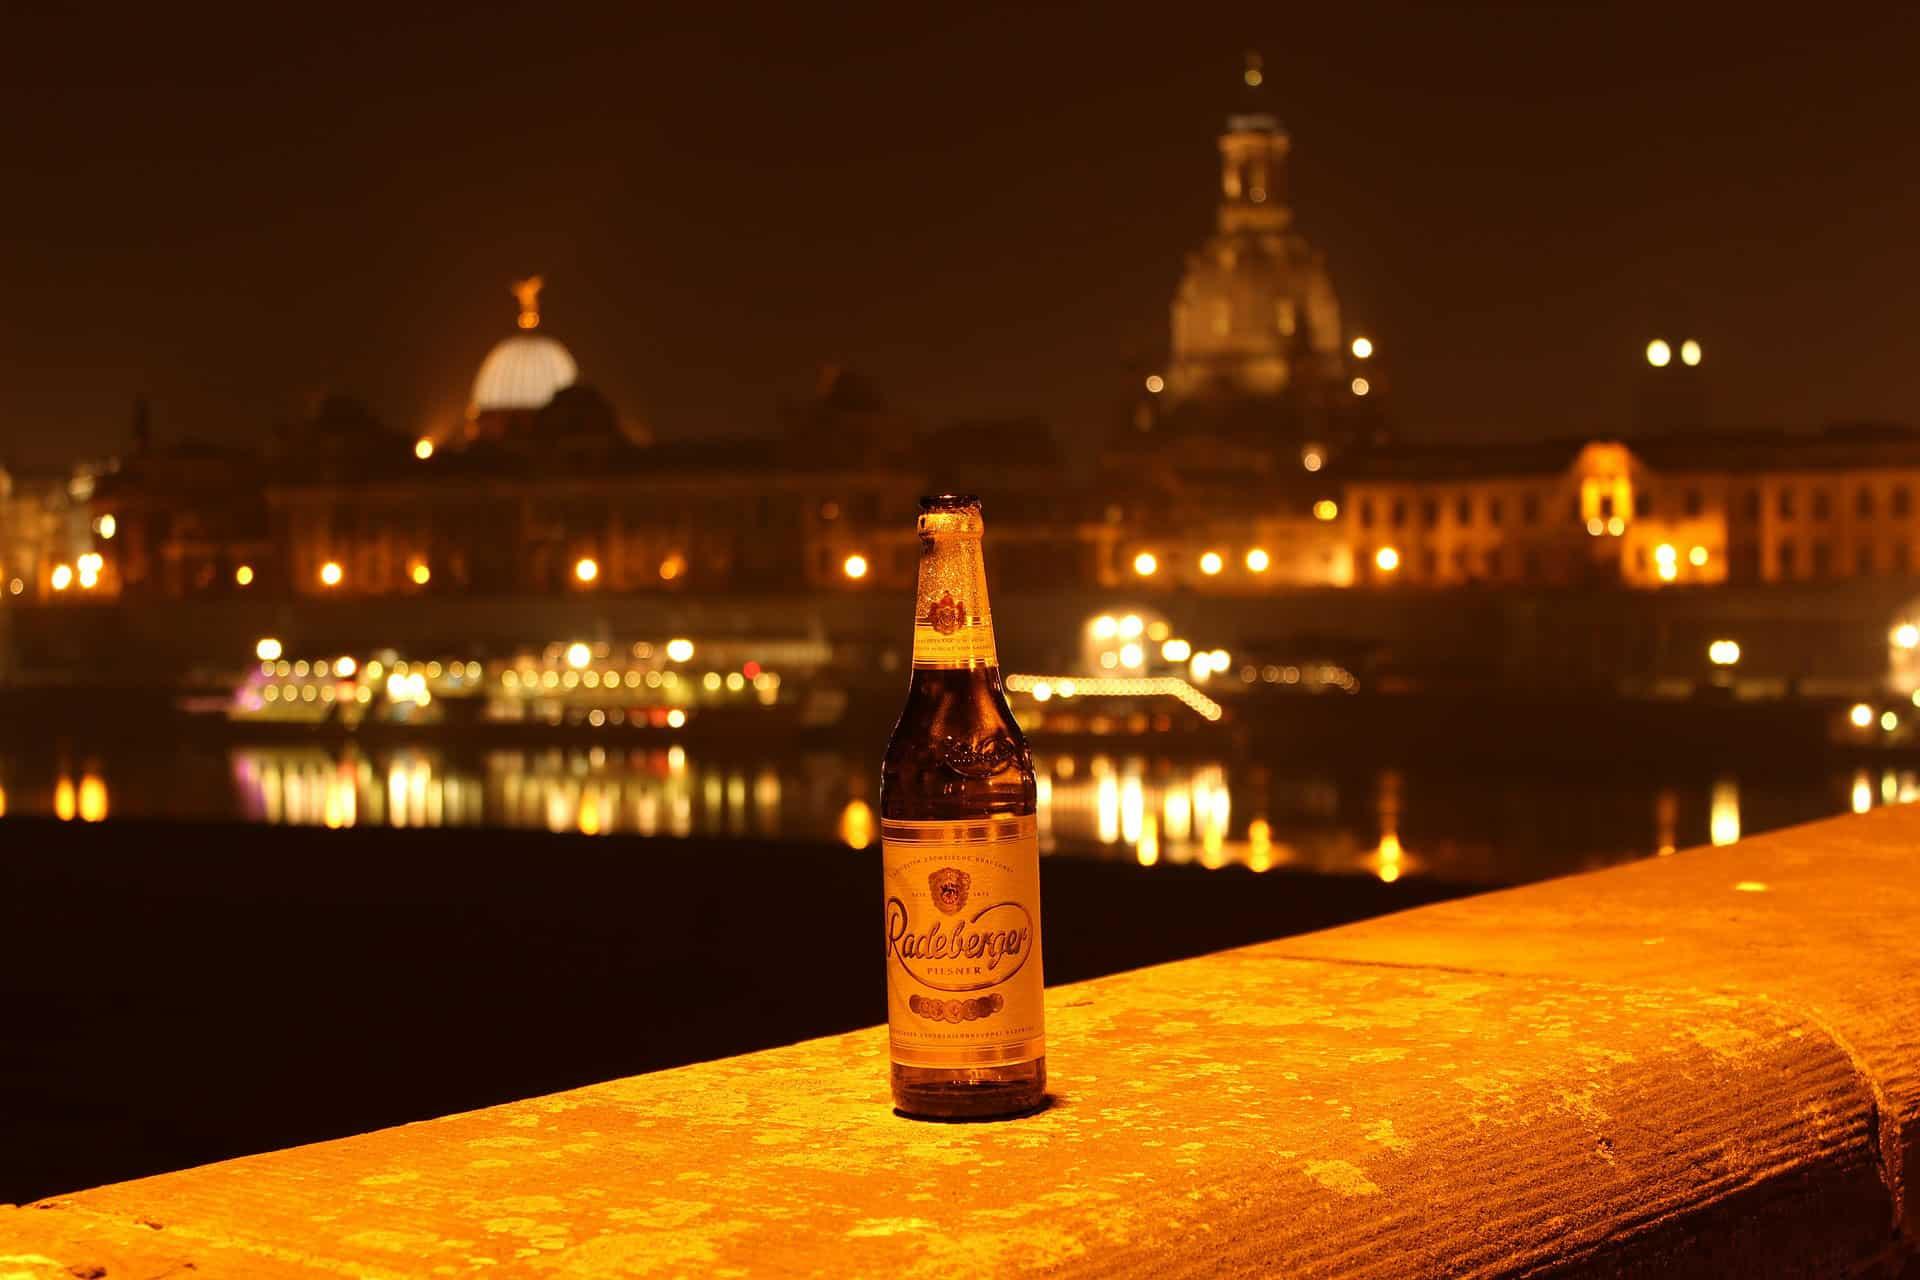 butelka piwa Radeberger z Dreznem w tle